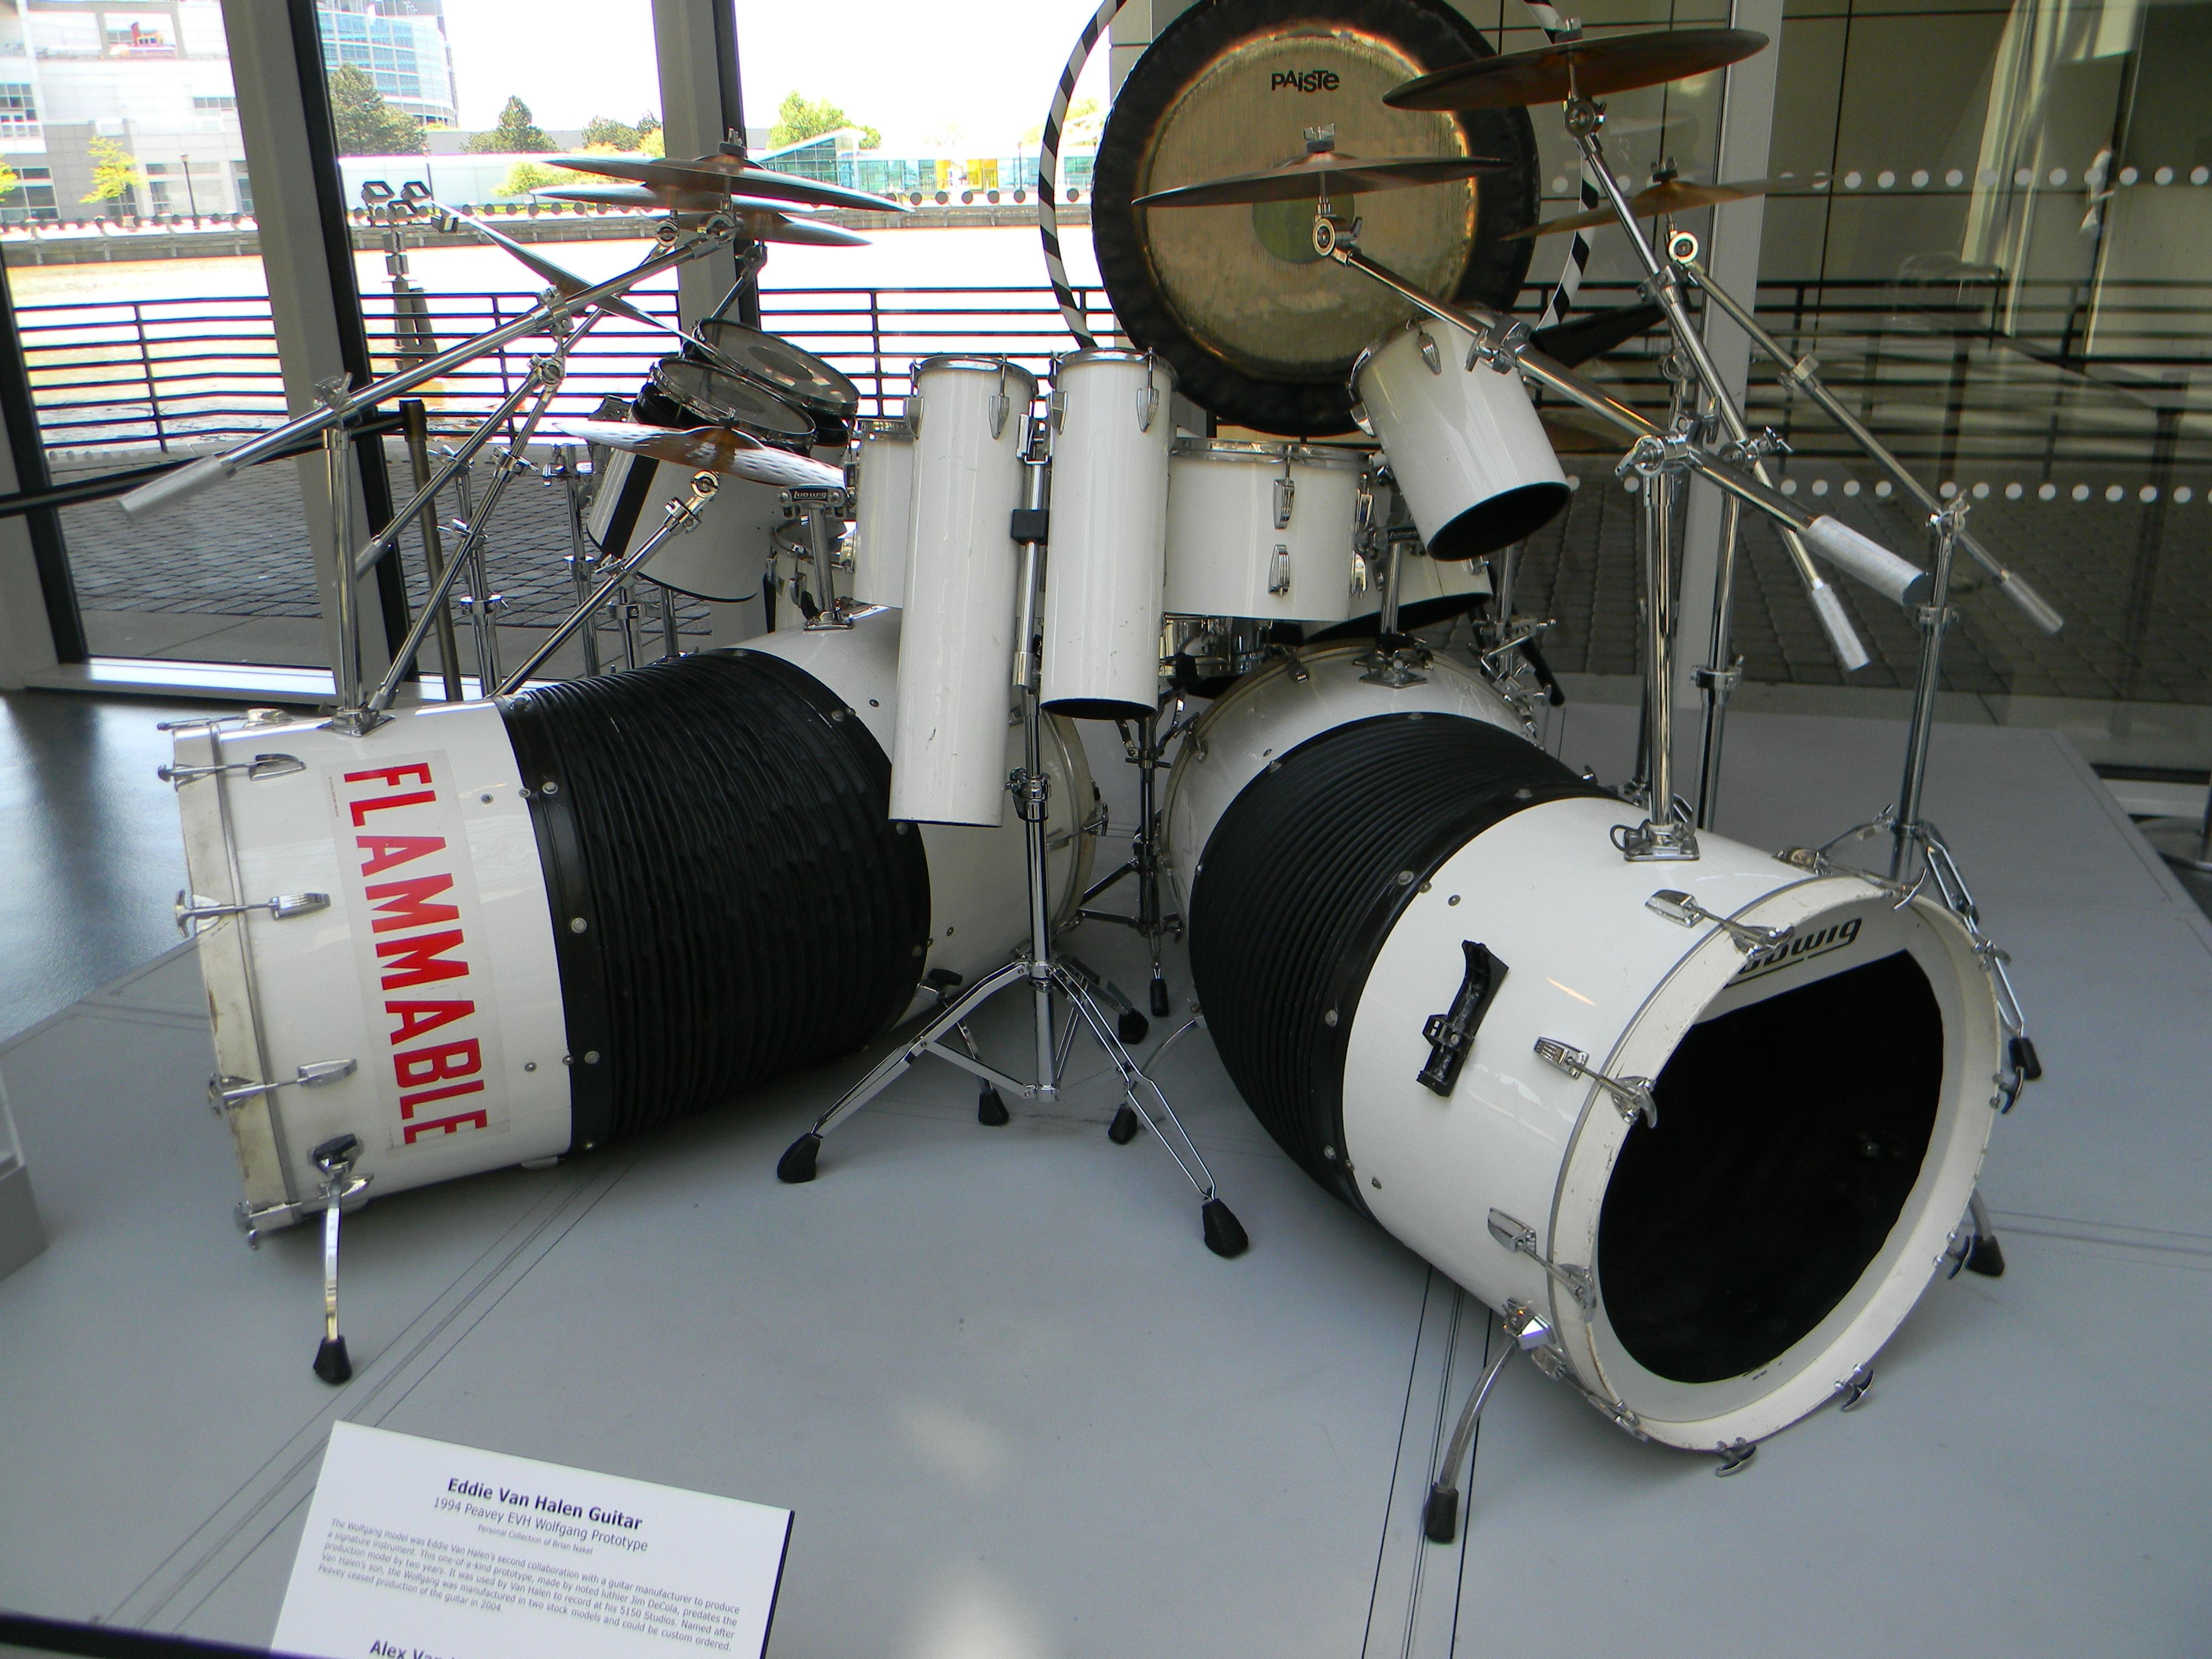 Alex Van Halen S Women And Children First Drum Set On Display At The Rock And Roll Hall Of Fame Drums Alex Van Halen Drum Set